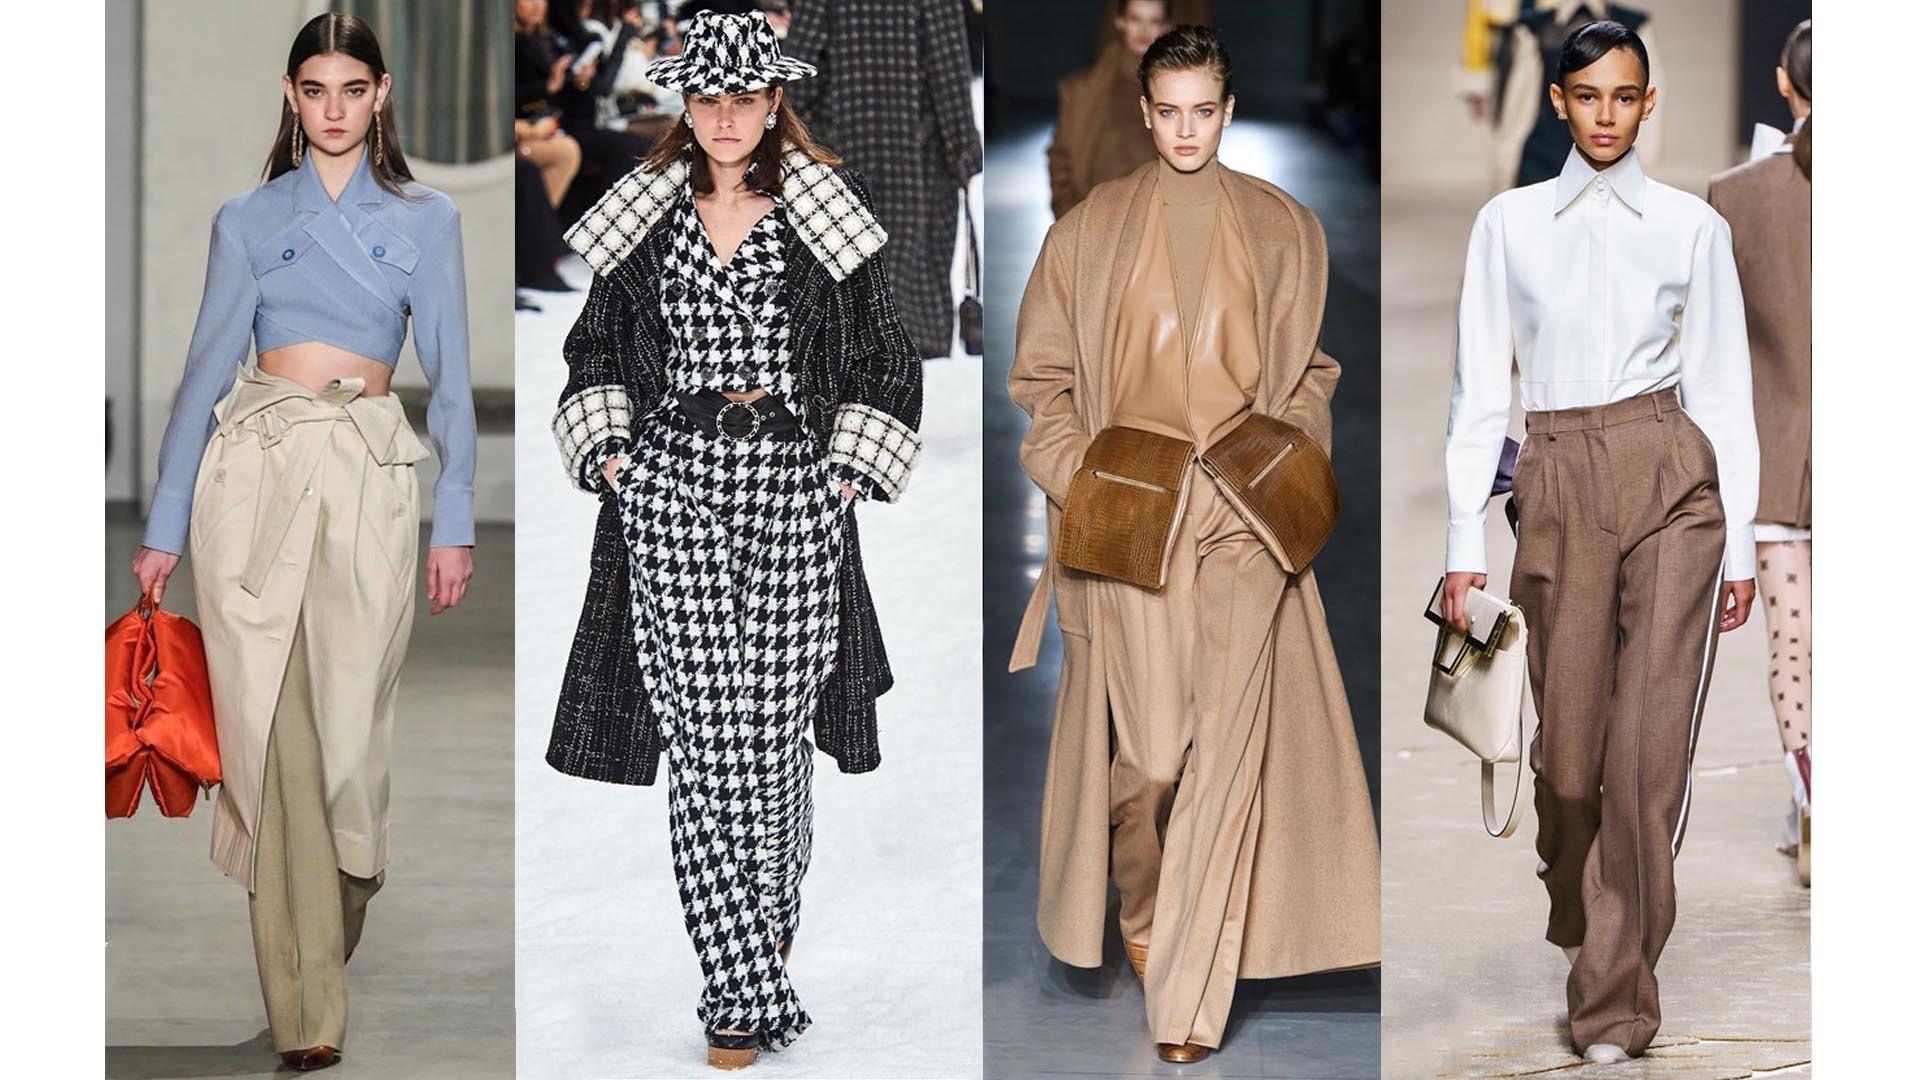 El poder femenino se refleja en las tendencias de la moda.